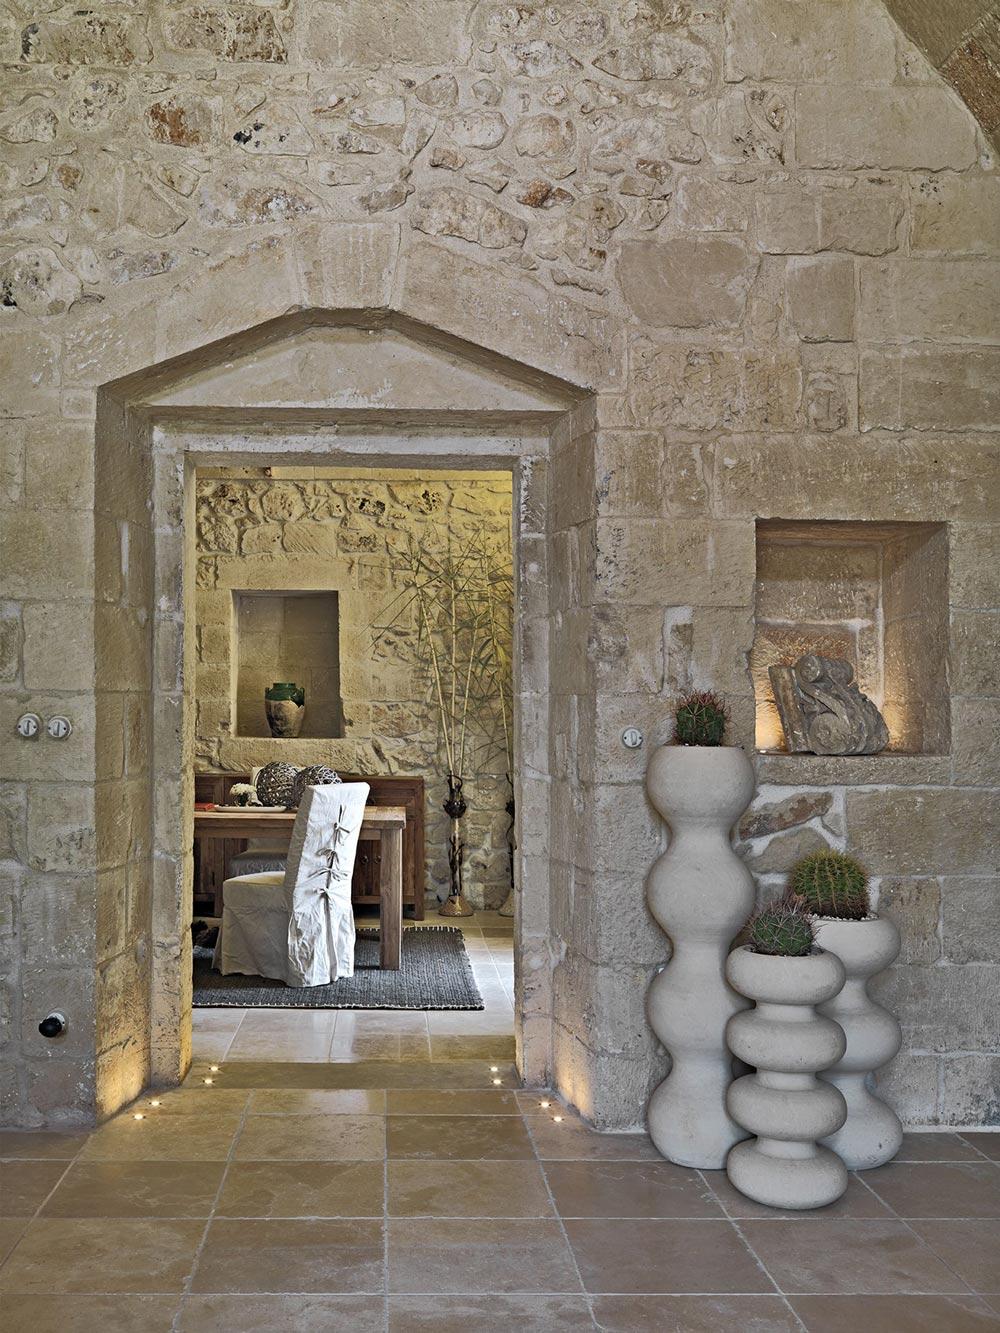 Stone Floor Tiles, Relais Masseria Capasa Hotel in Martano, Italy